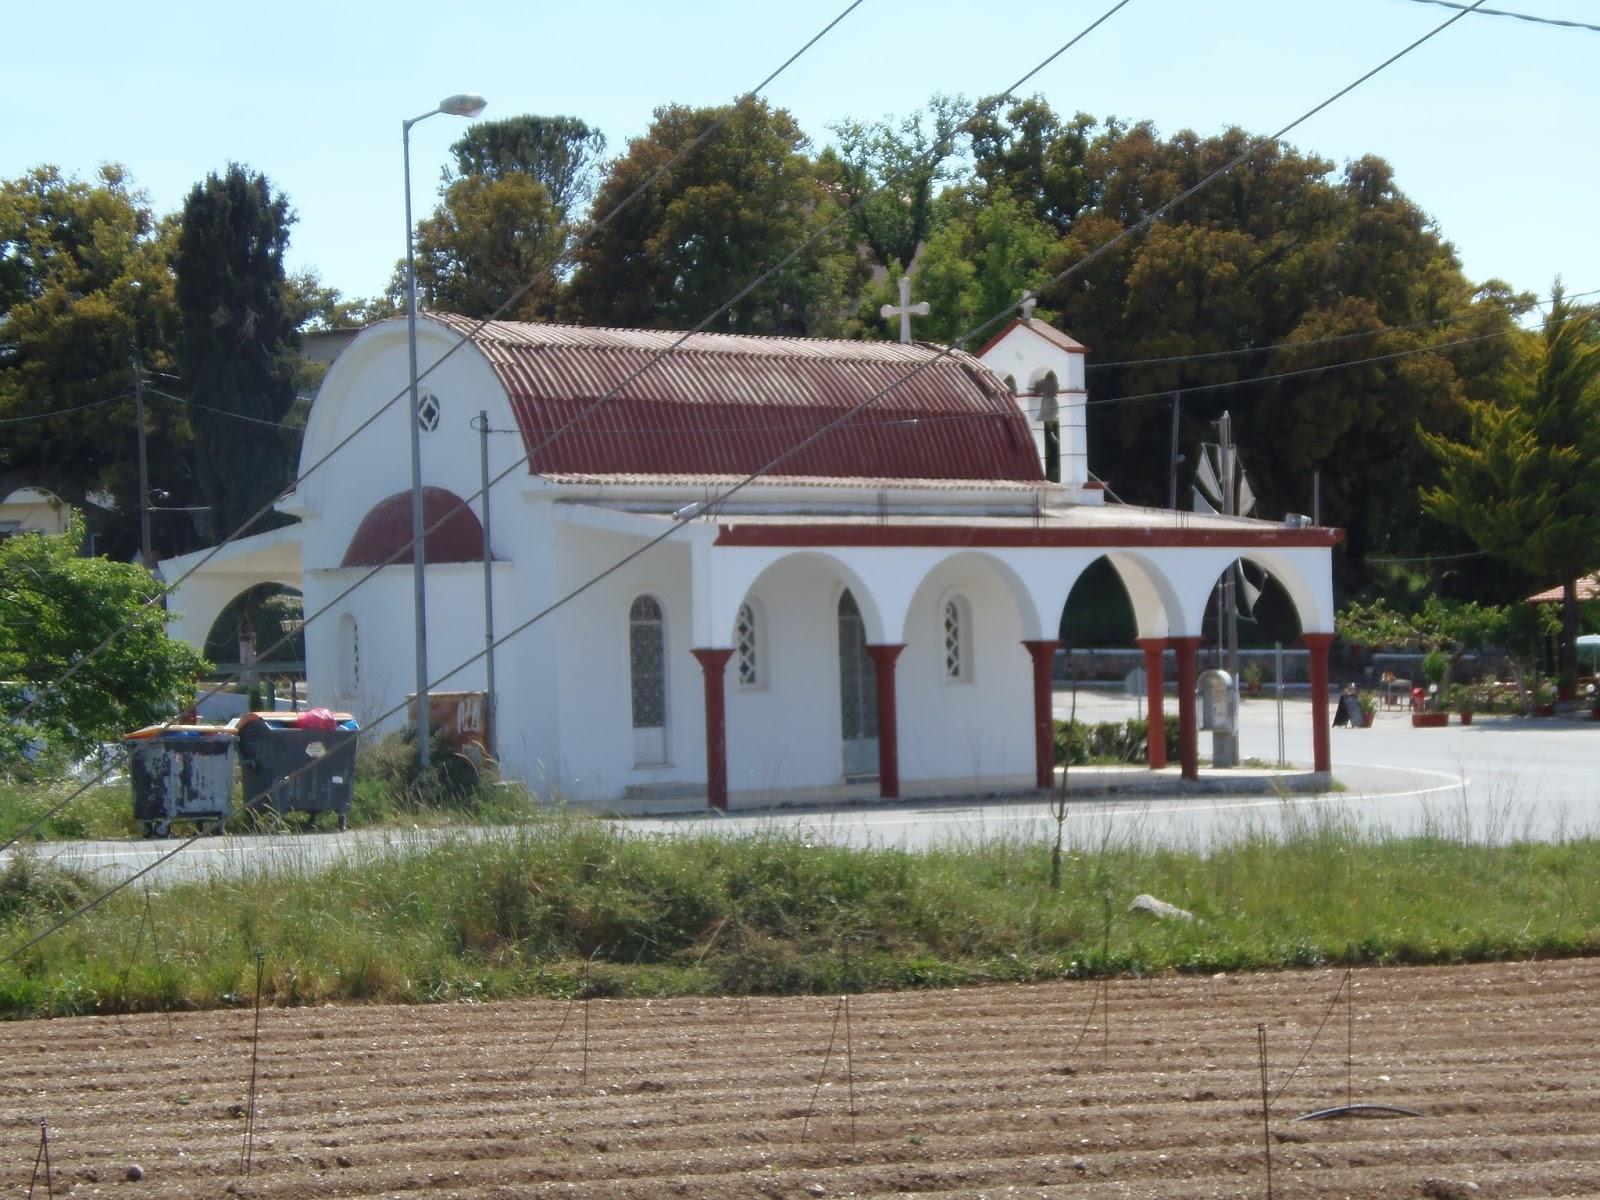 church, christian, village, religion, crete, greece, orthodox christian, eastern, greek, travel, traveling, food